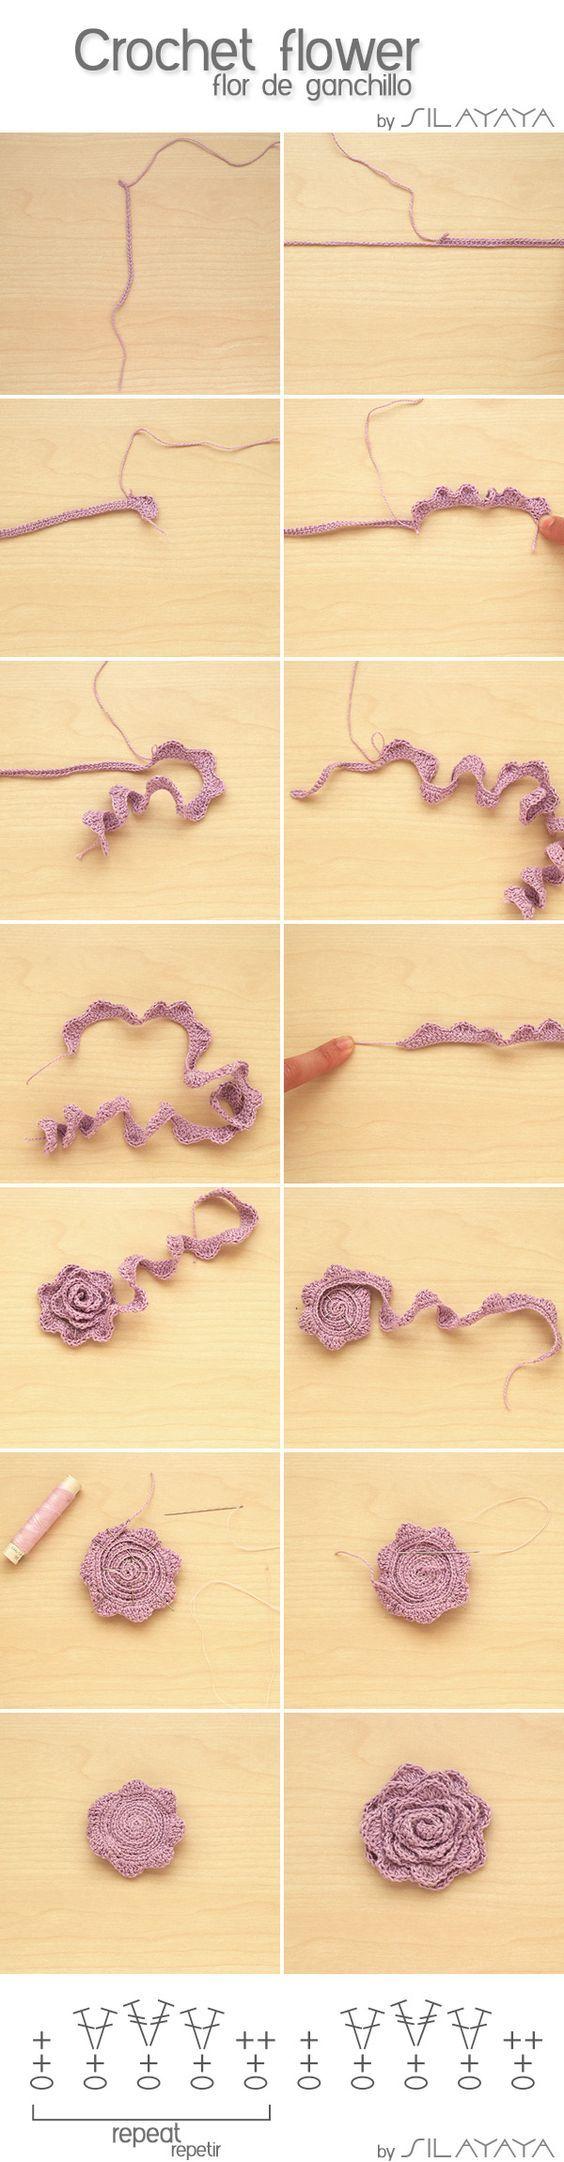 Tutorial How to crochet a flower: